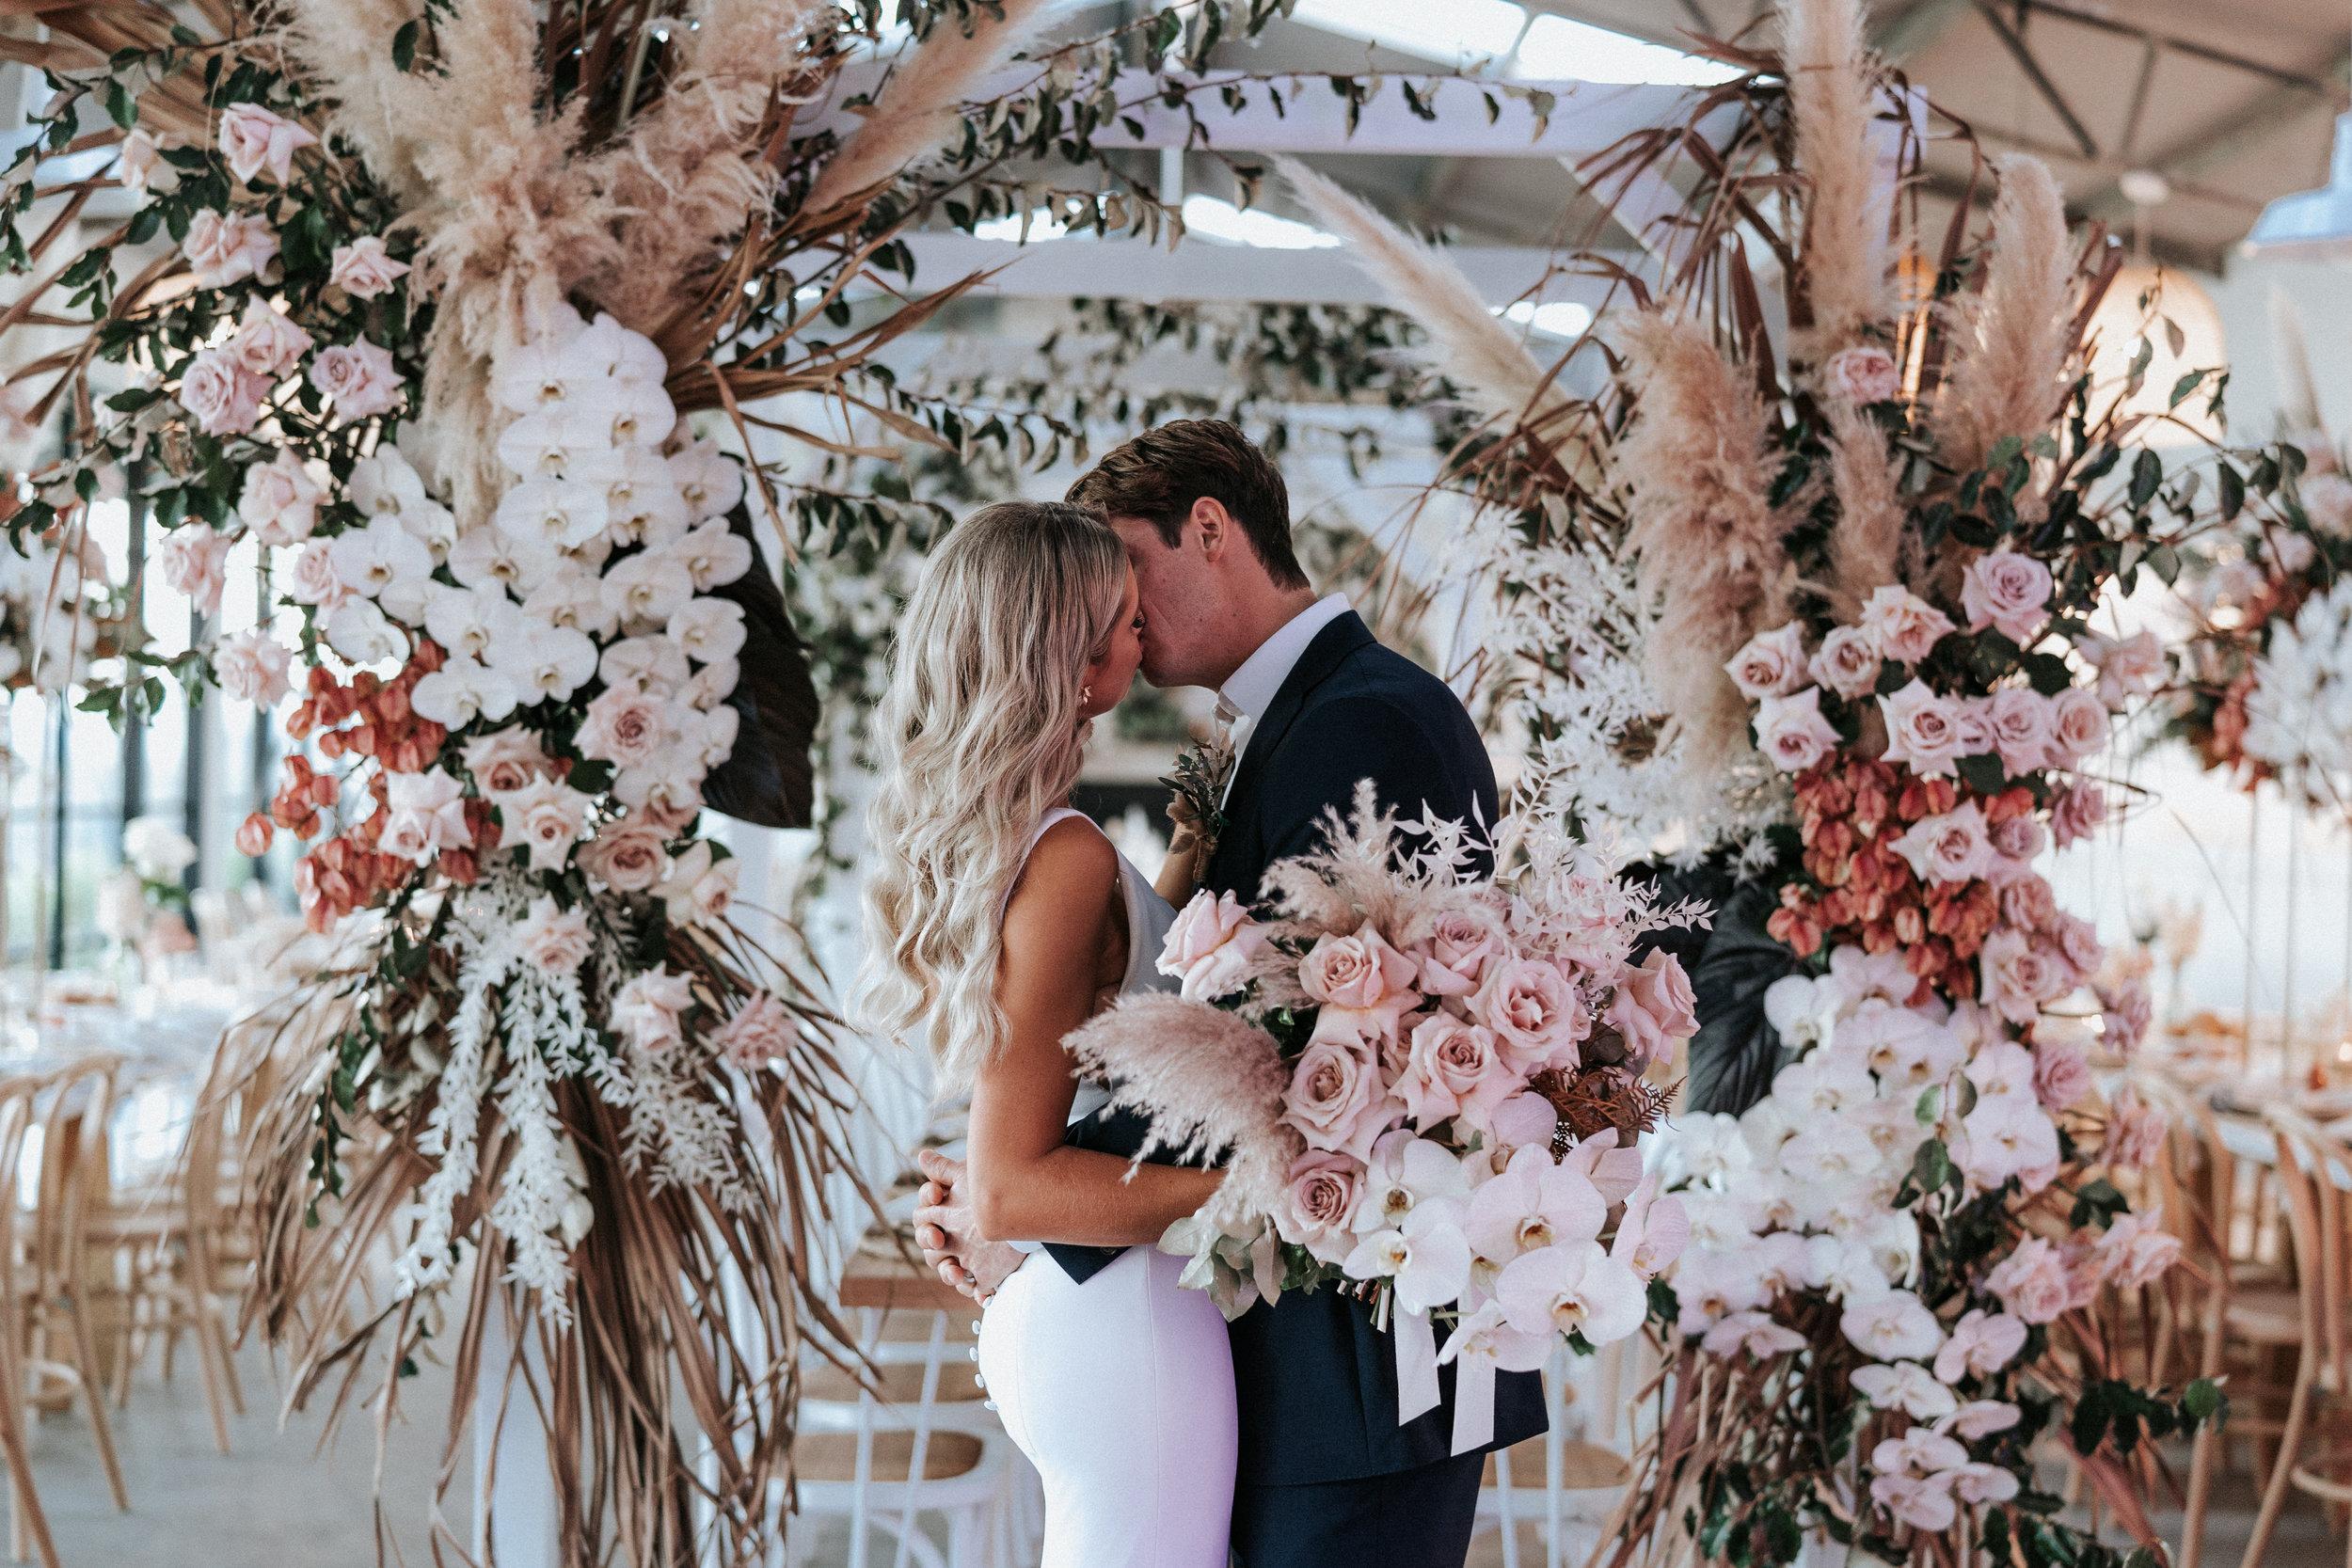 gemaya-tim-bilmon-wedding-756.jpg